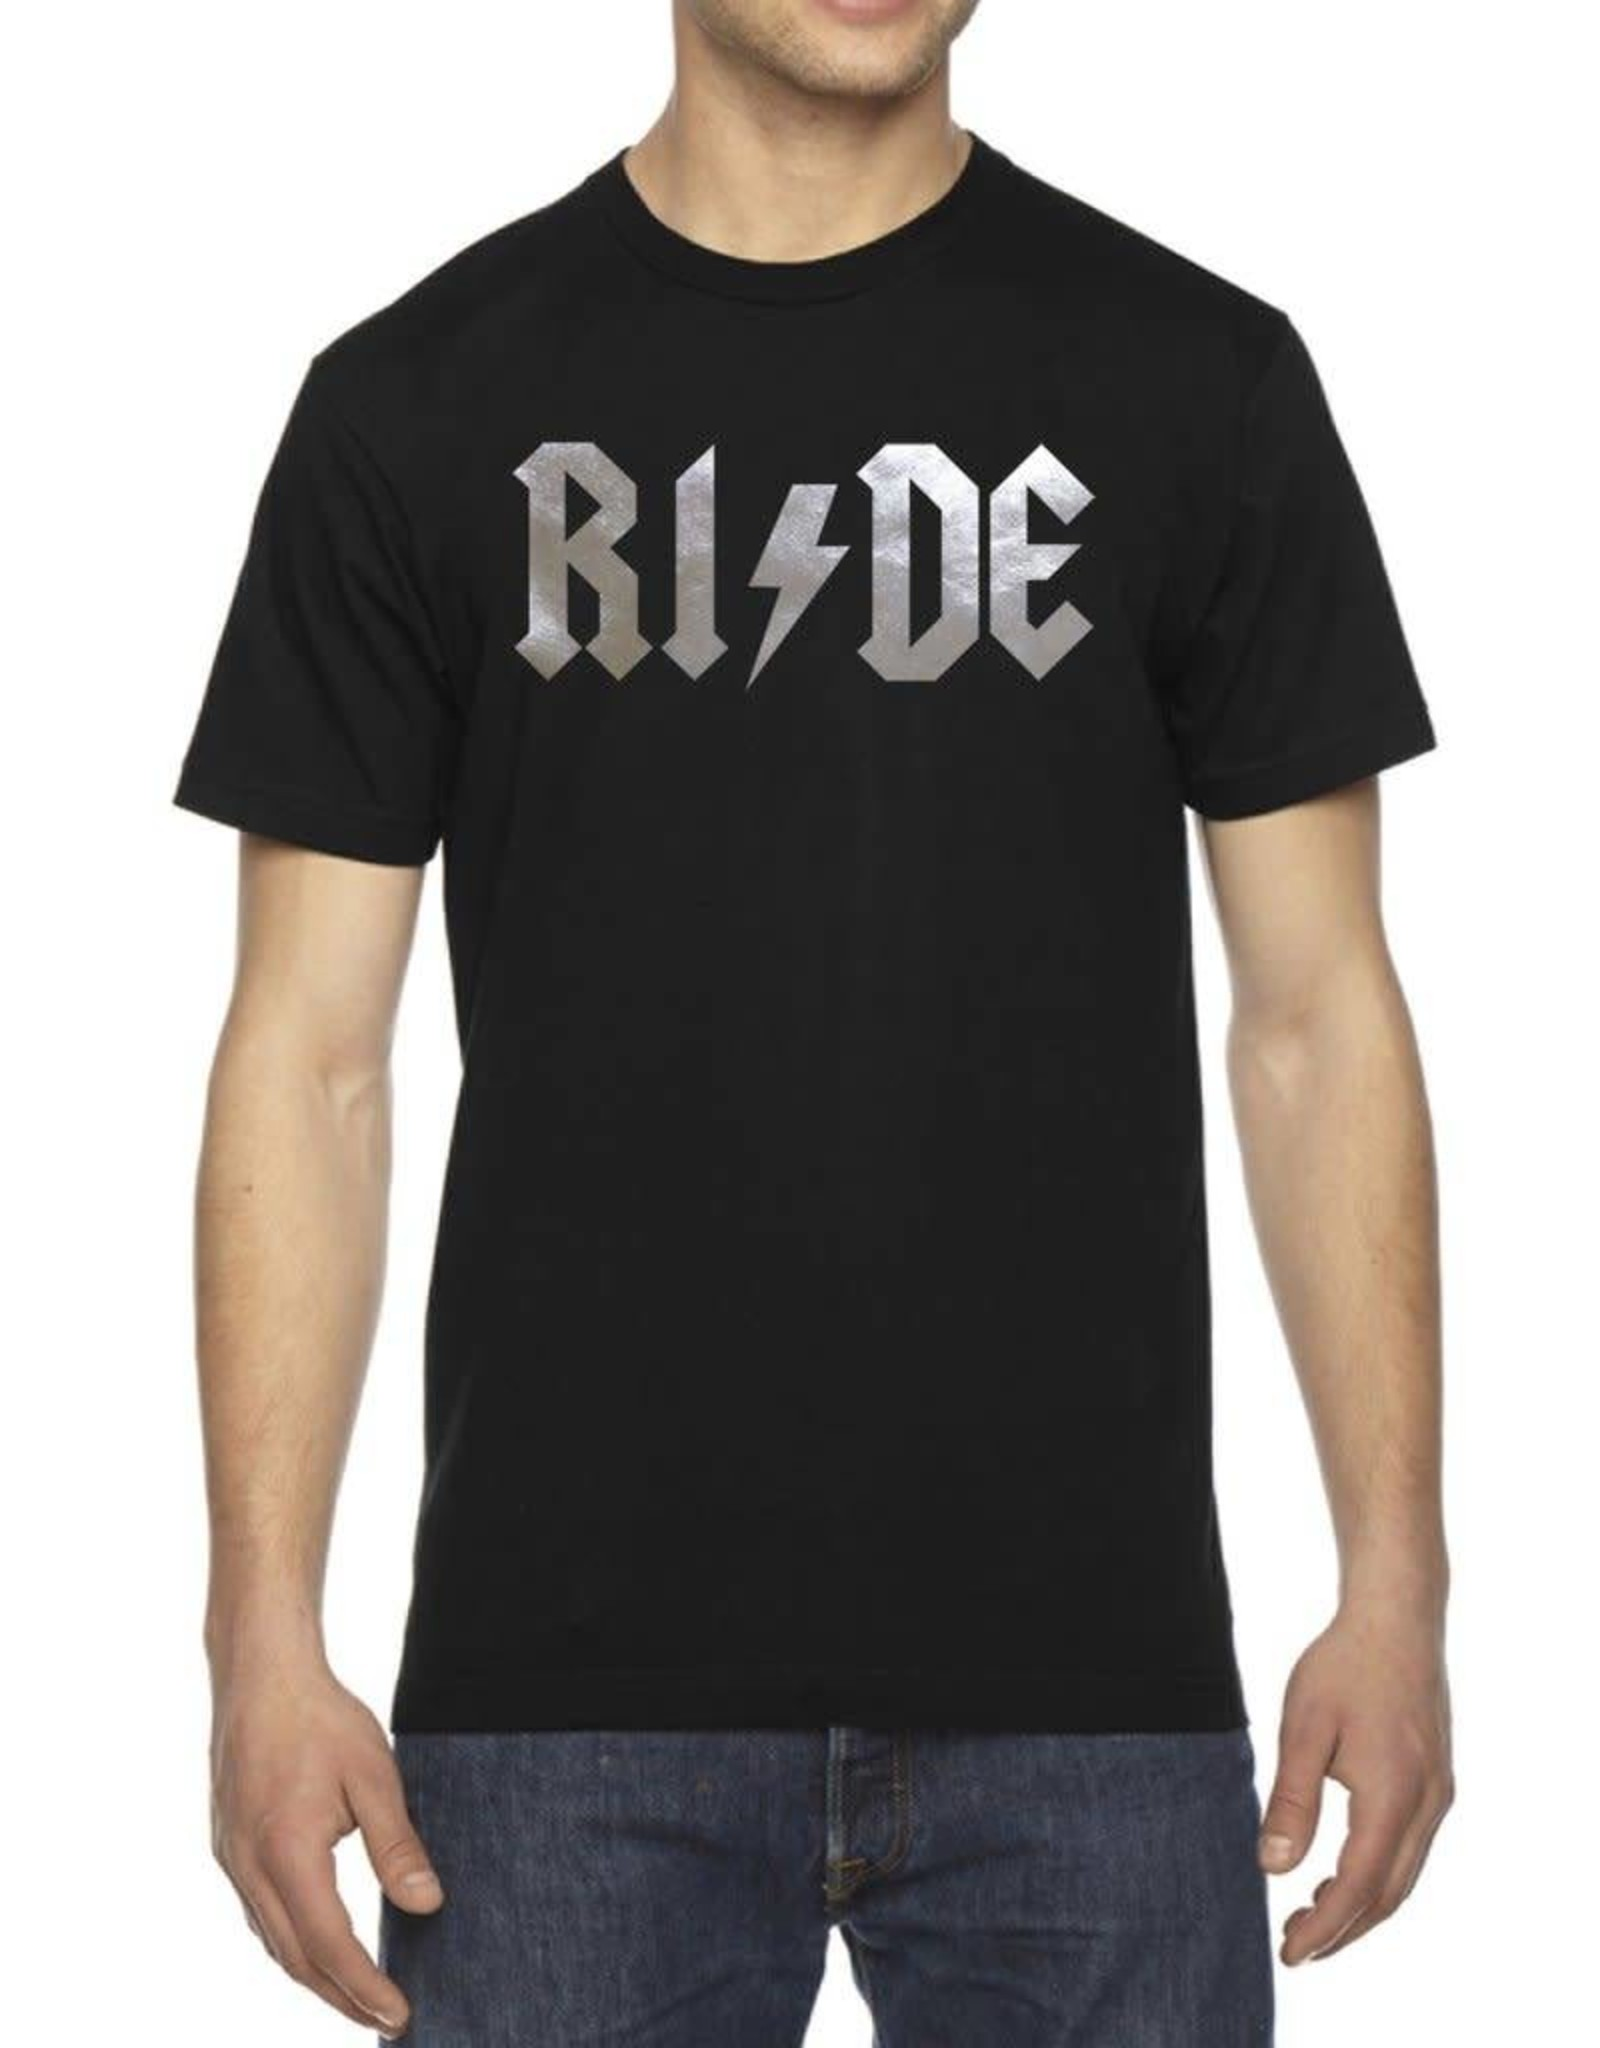 SFC Casual Cycling Clothing T Shirt - Ride Foil